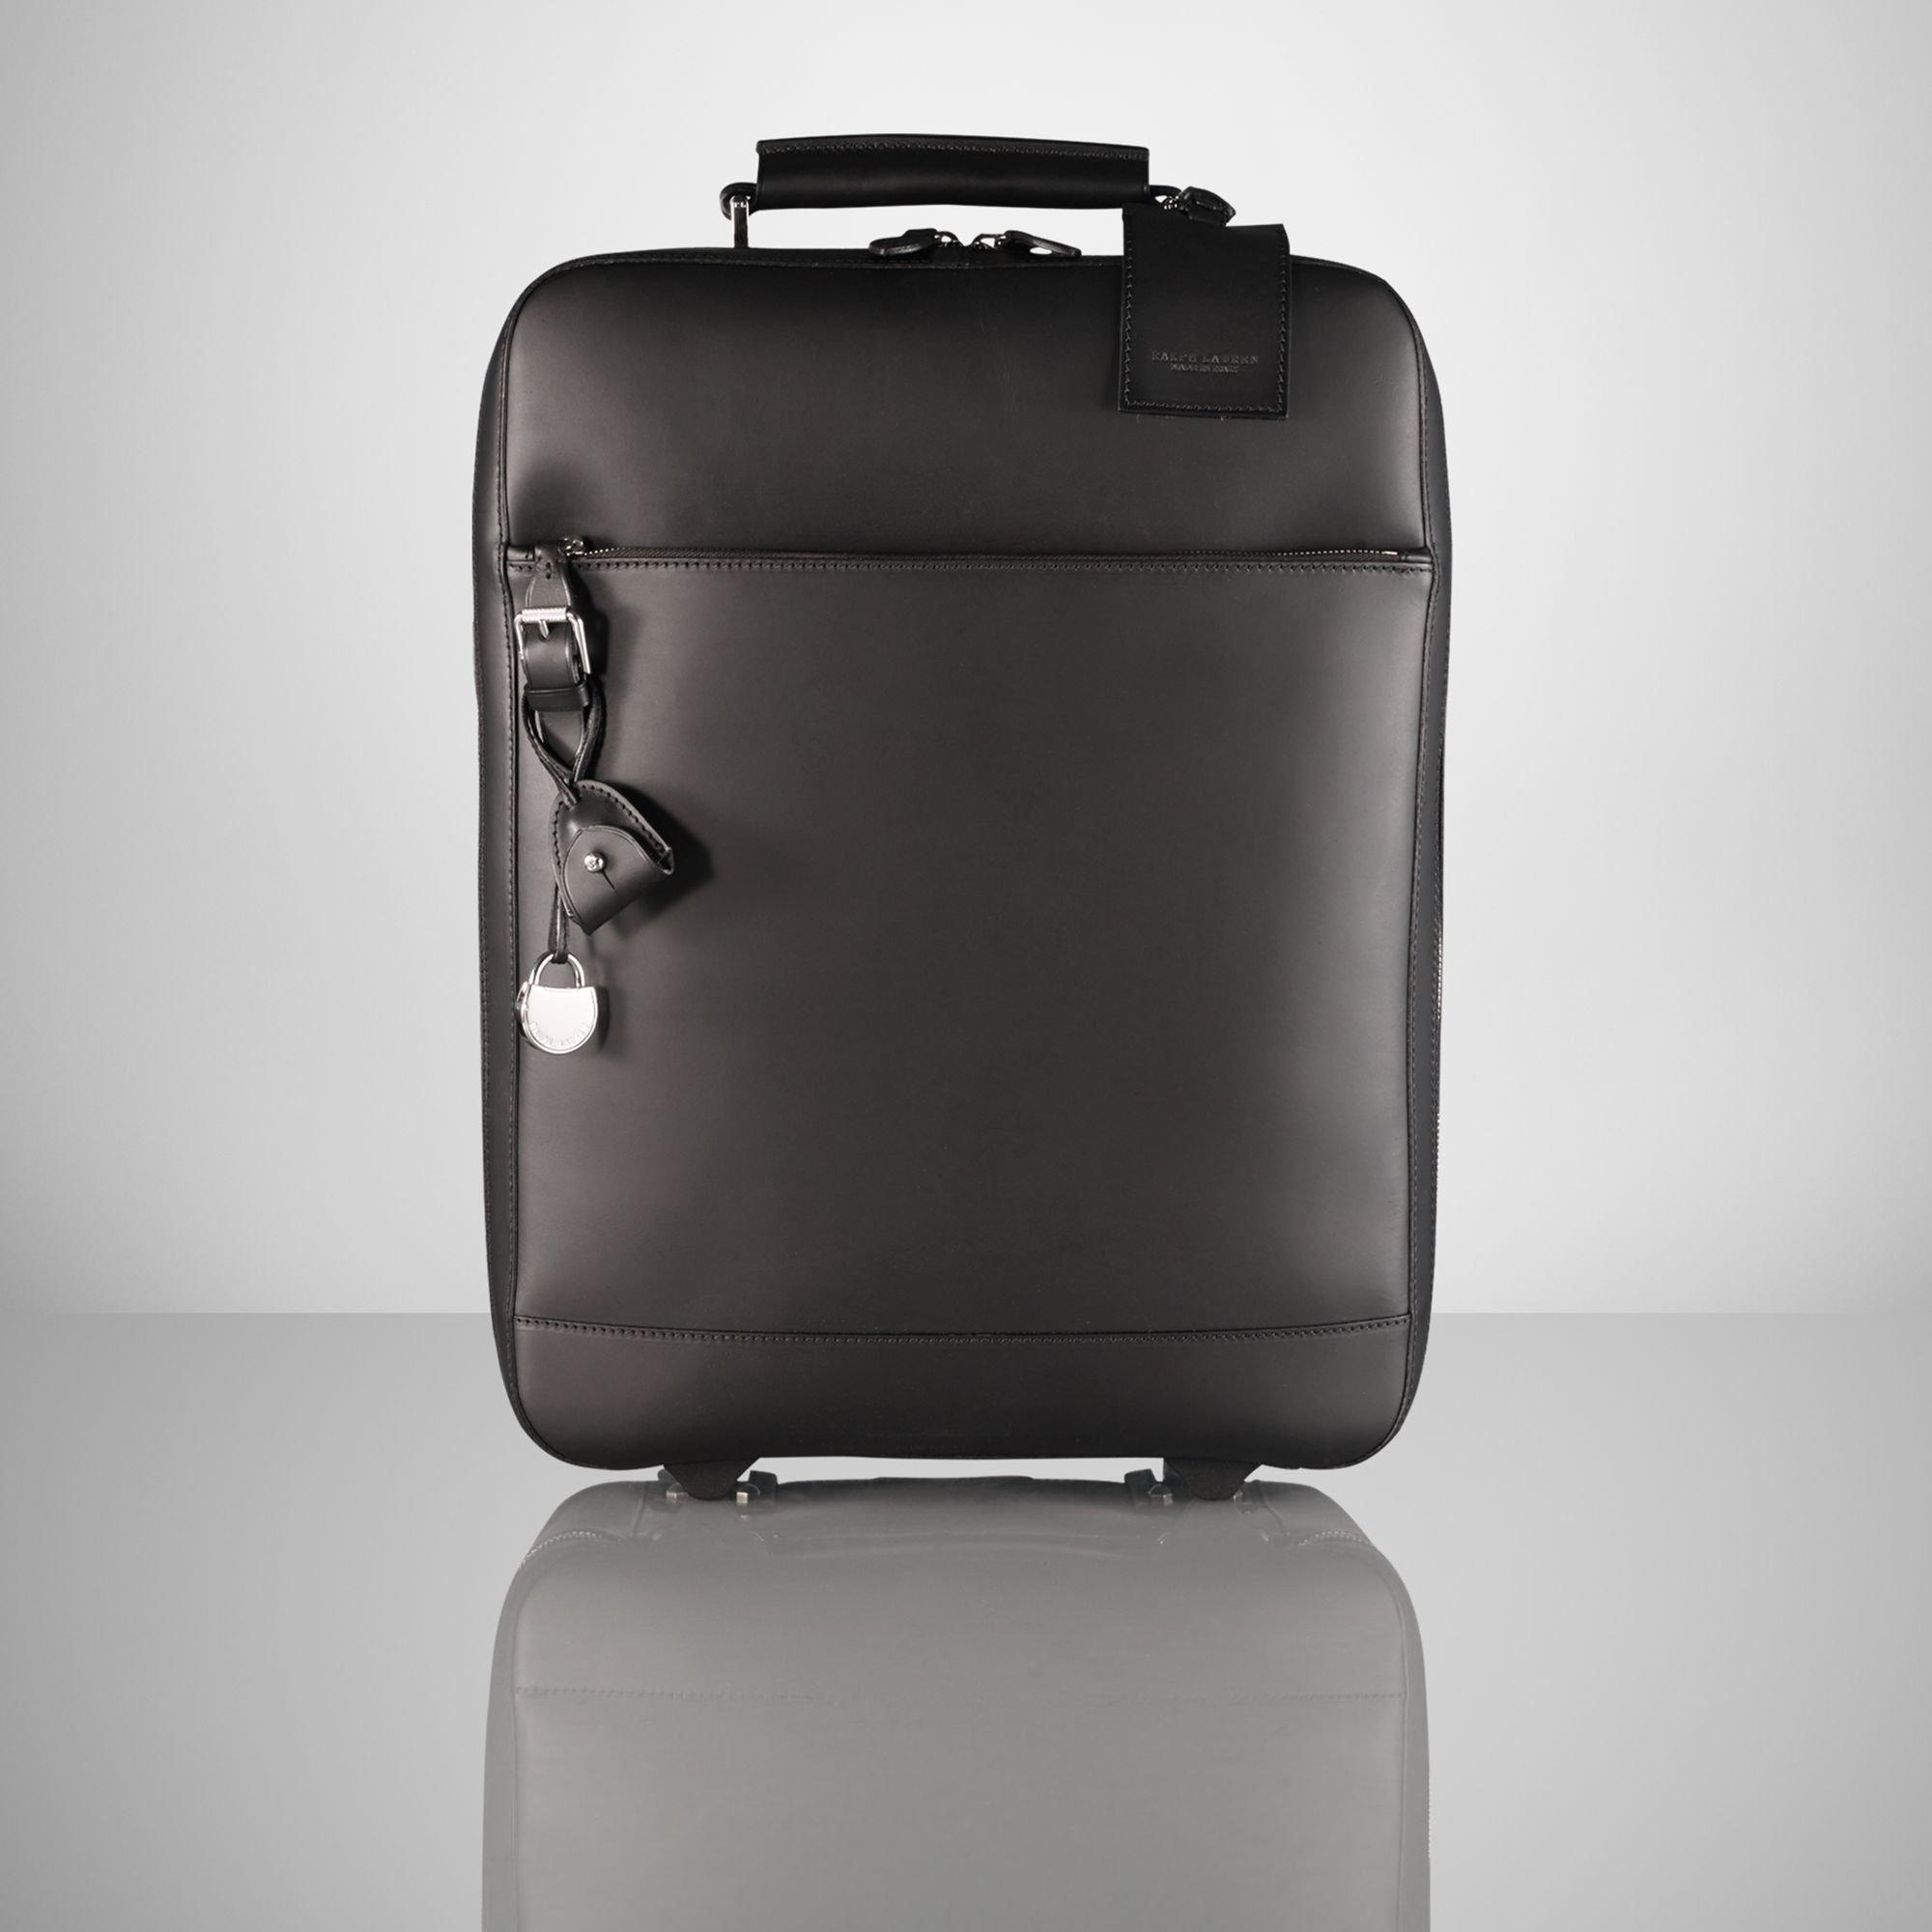 b18a4bdafe34 Ralph lauren large leather trolley in black for men lyst jpg 2000x2000 Ralph  lauren luggage trolley